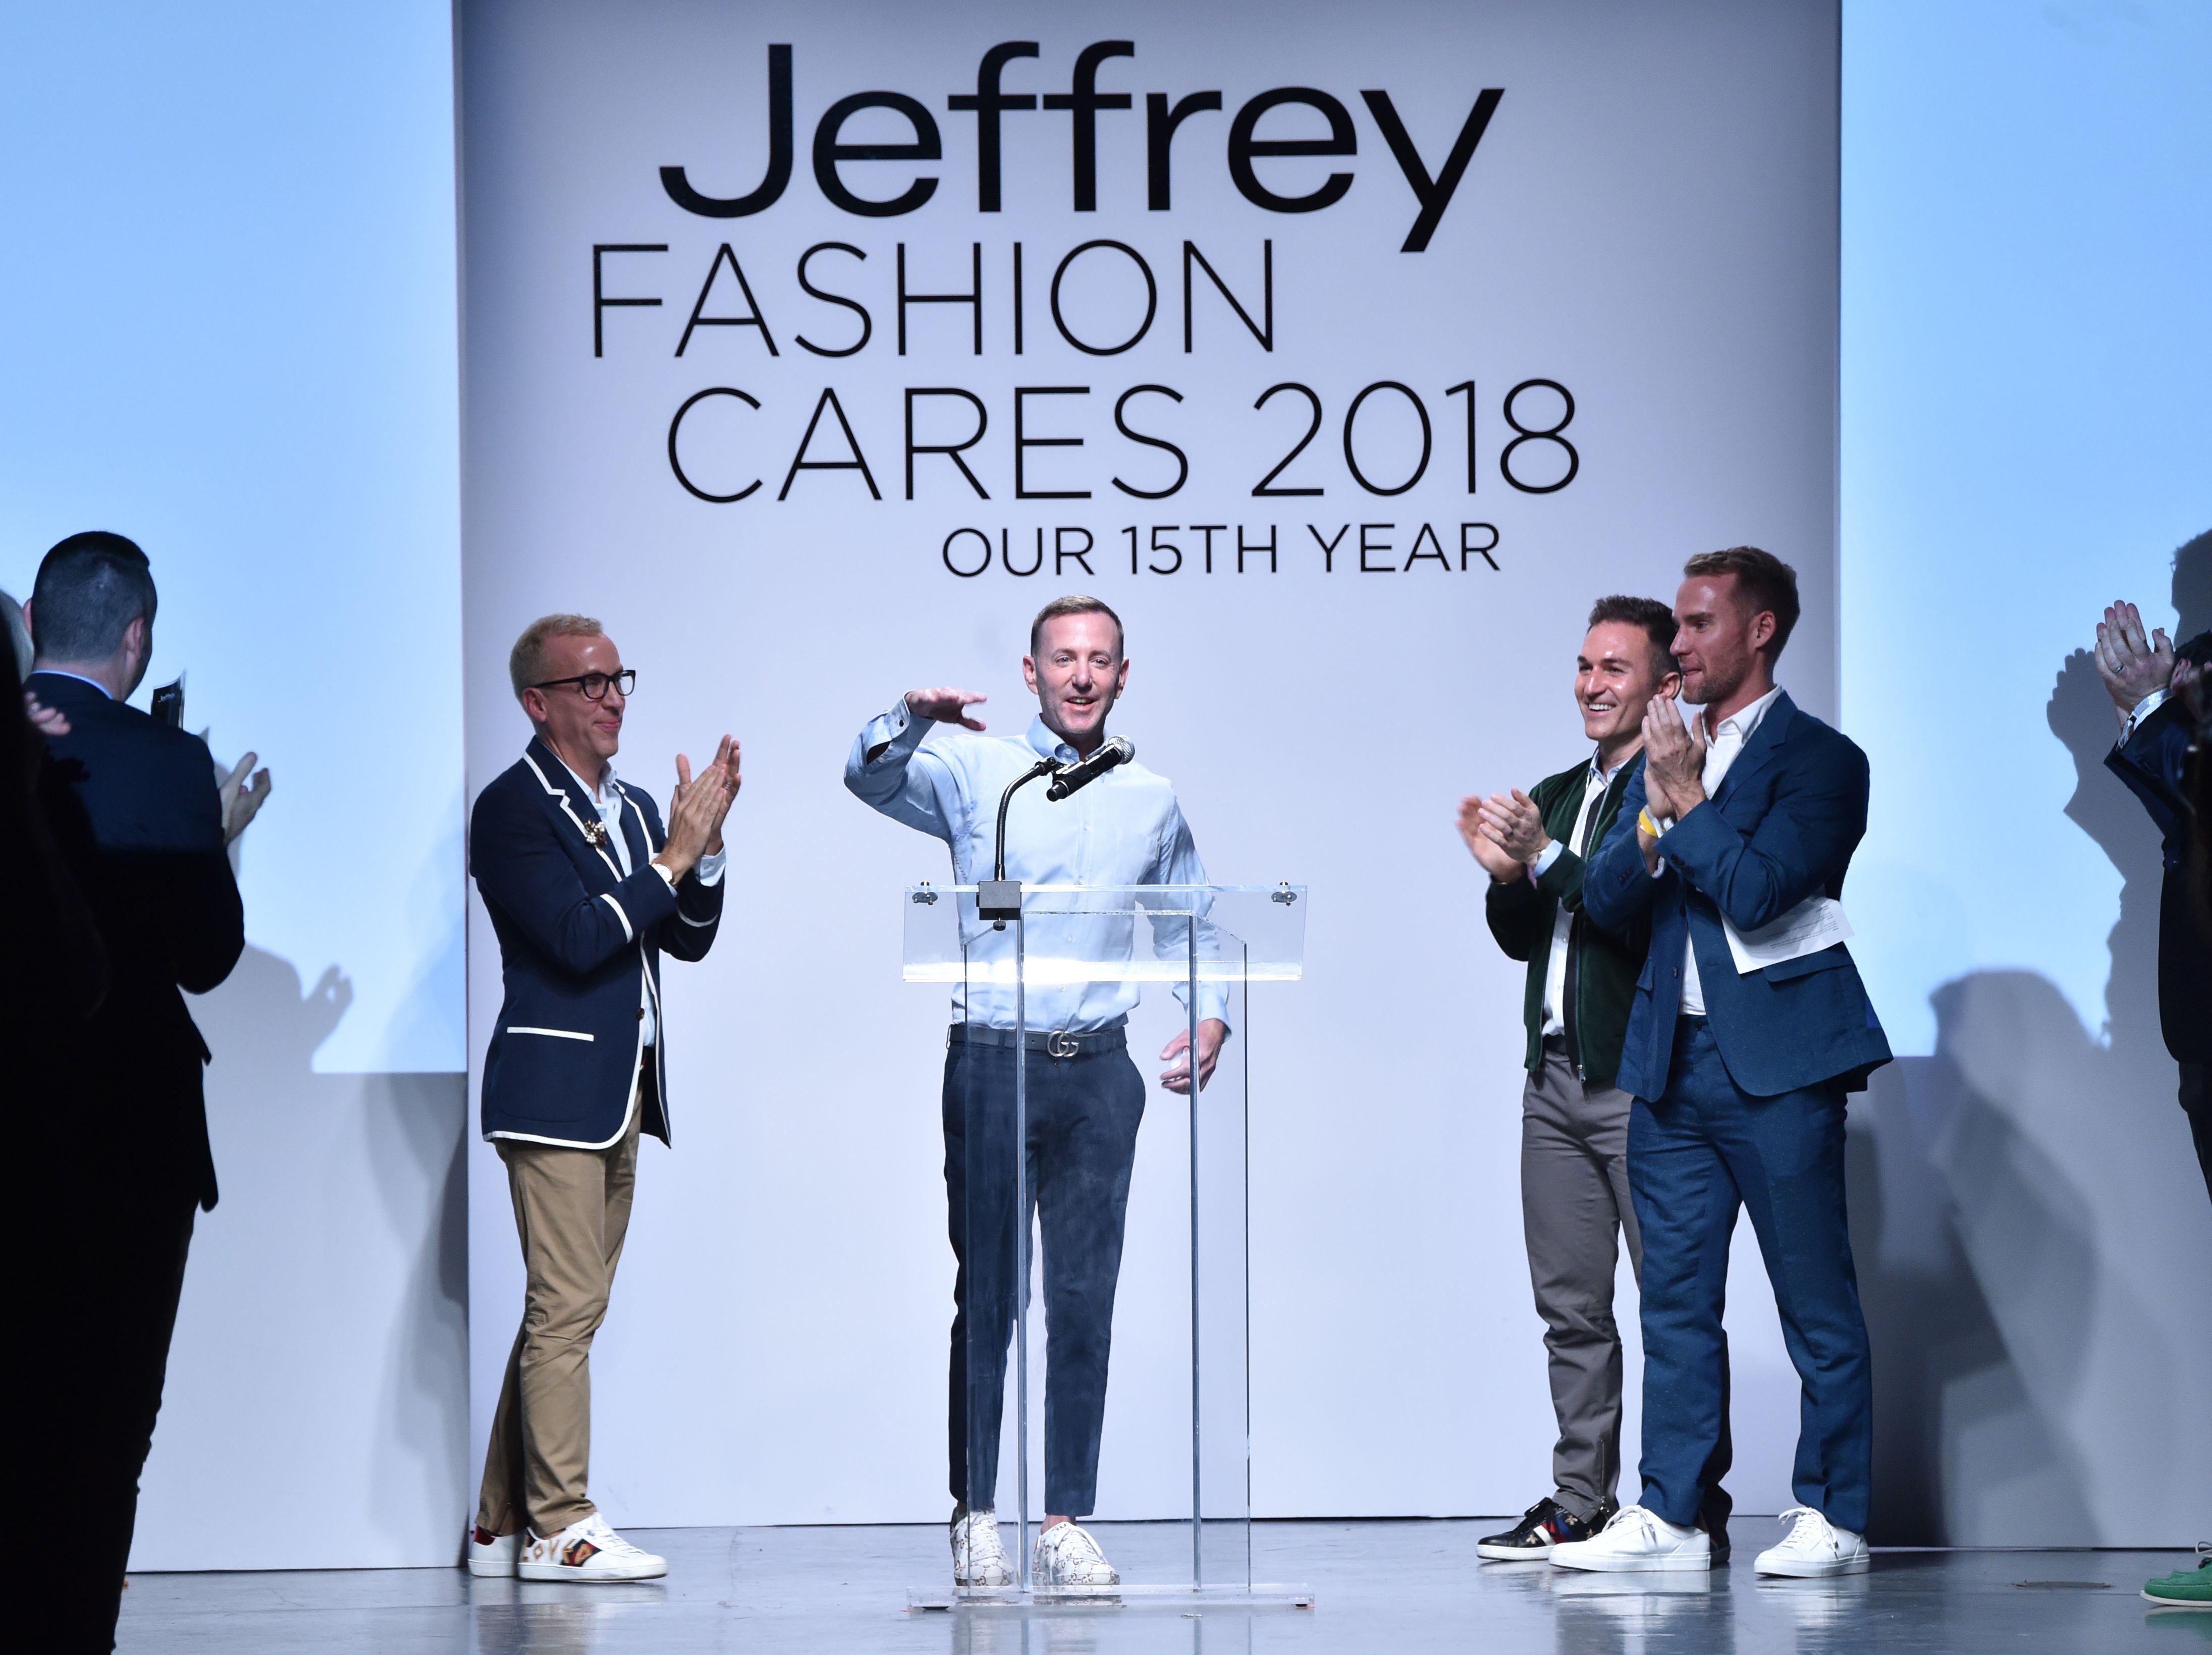 Jeffery KalinskyJeffrey Fashion Cares Fashion Show and Fundraiser, Runway, New York, USA - 11 Apr 2018